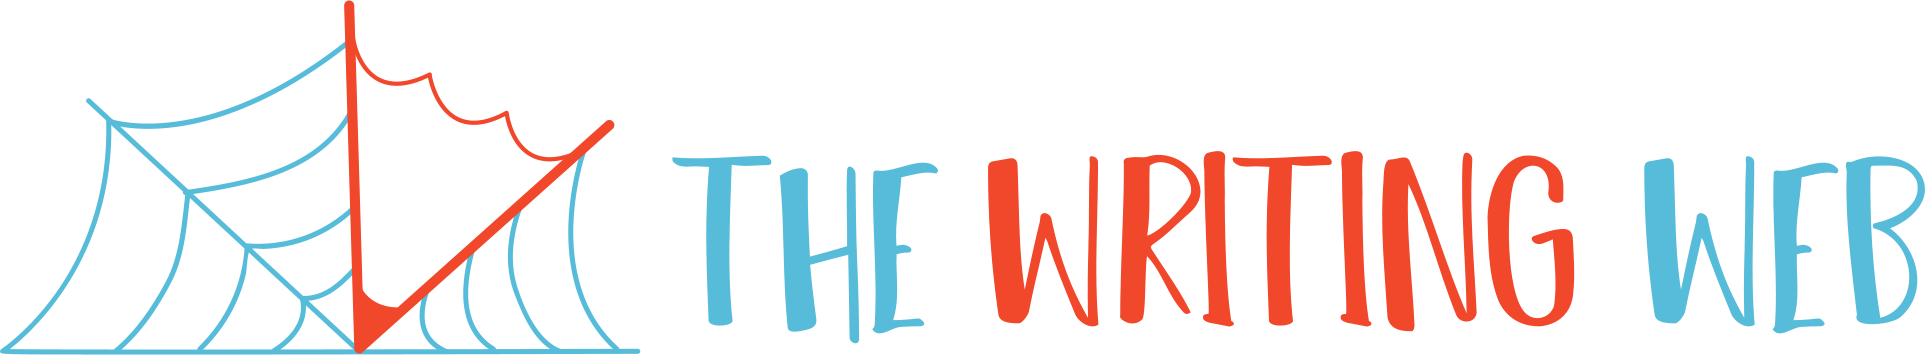 The Writing Web